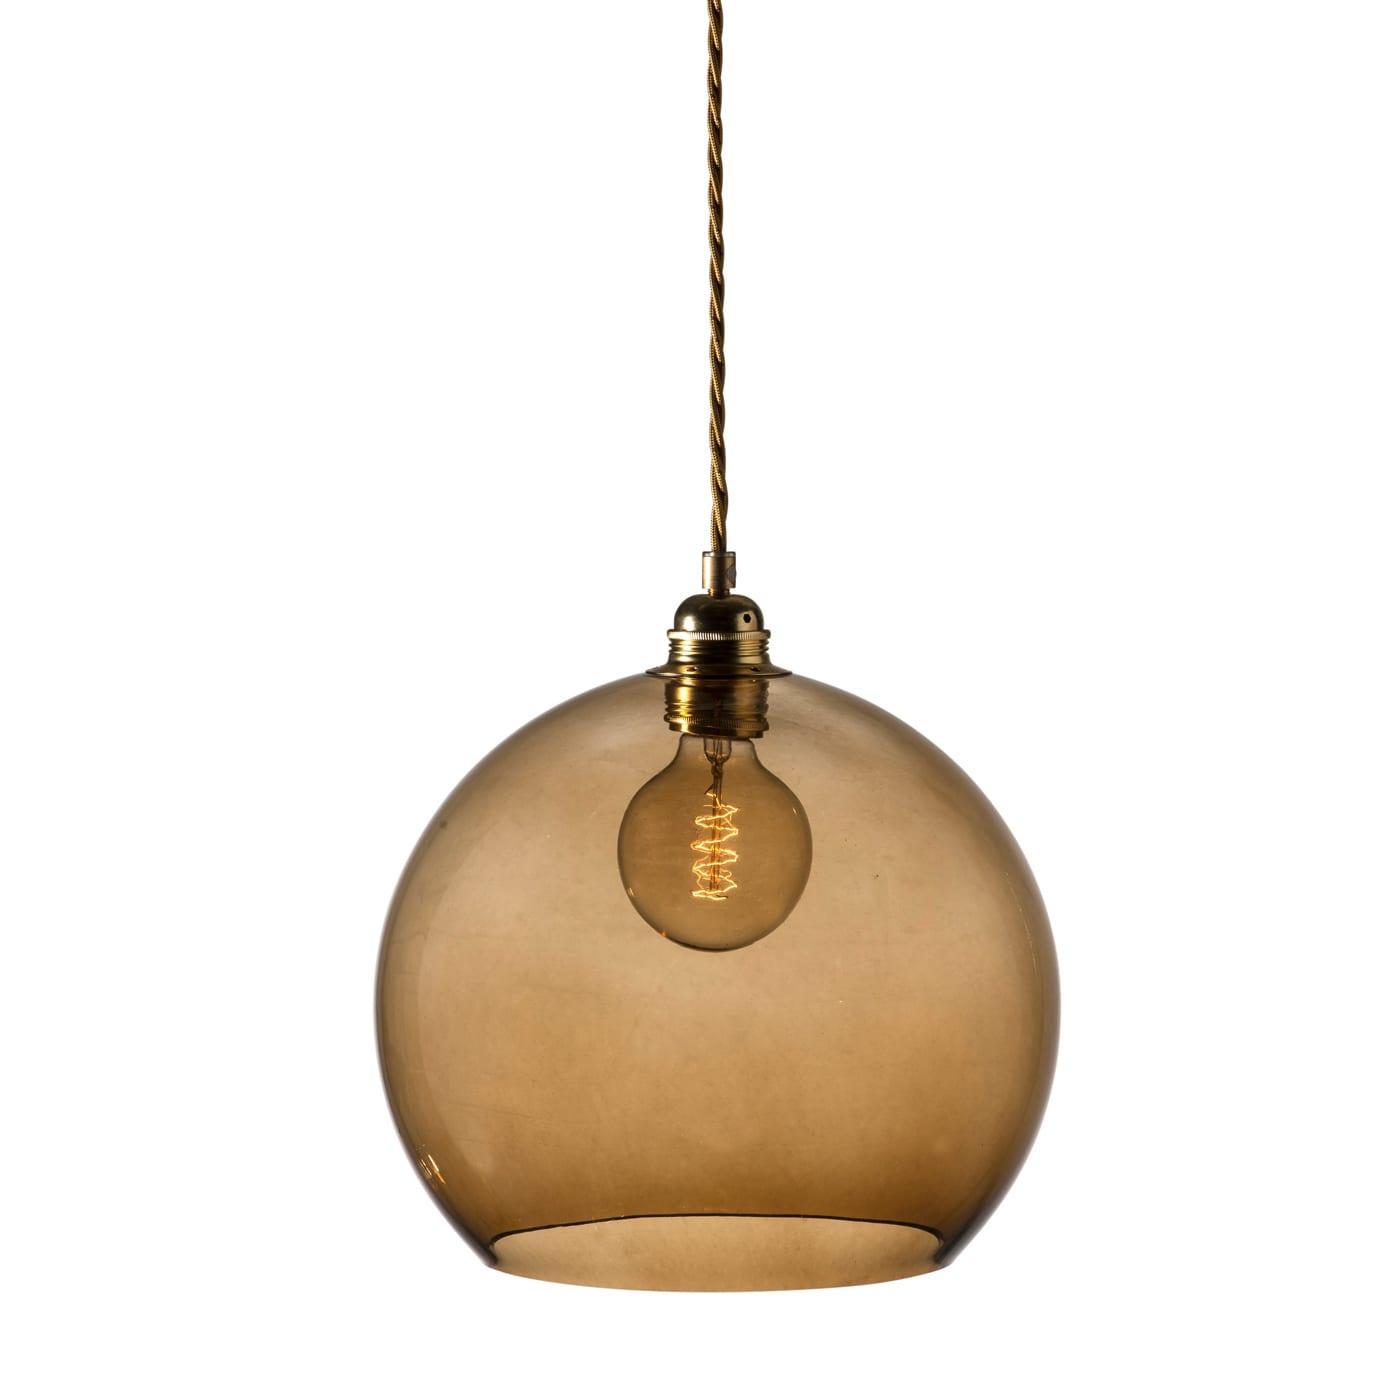 Rowan pendant lamp, chestnut brown, 28cm